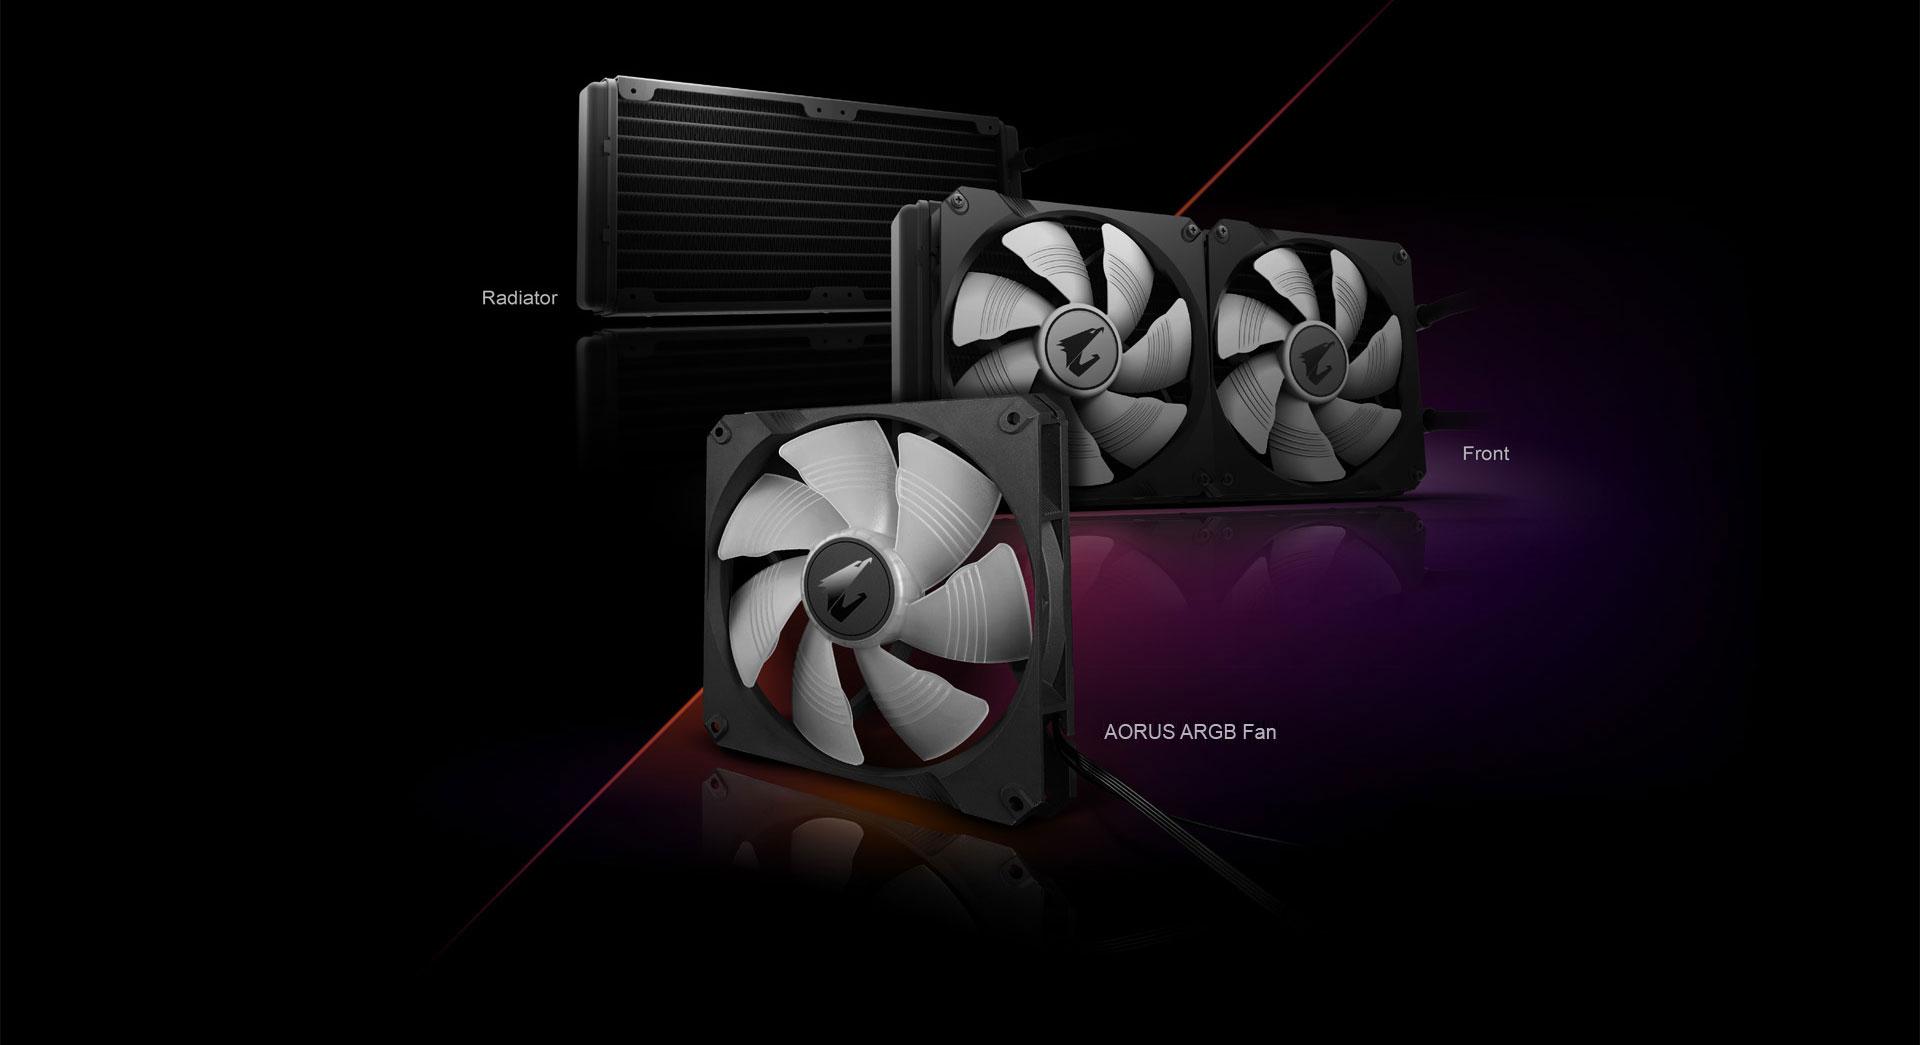 AORUS RGB Liquid Cooler 280 - Liquid cooling system CPU water block - LGA1151 Socket / LGA1155